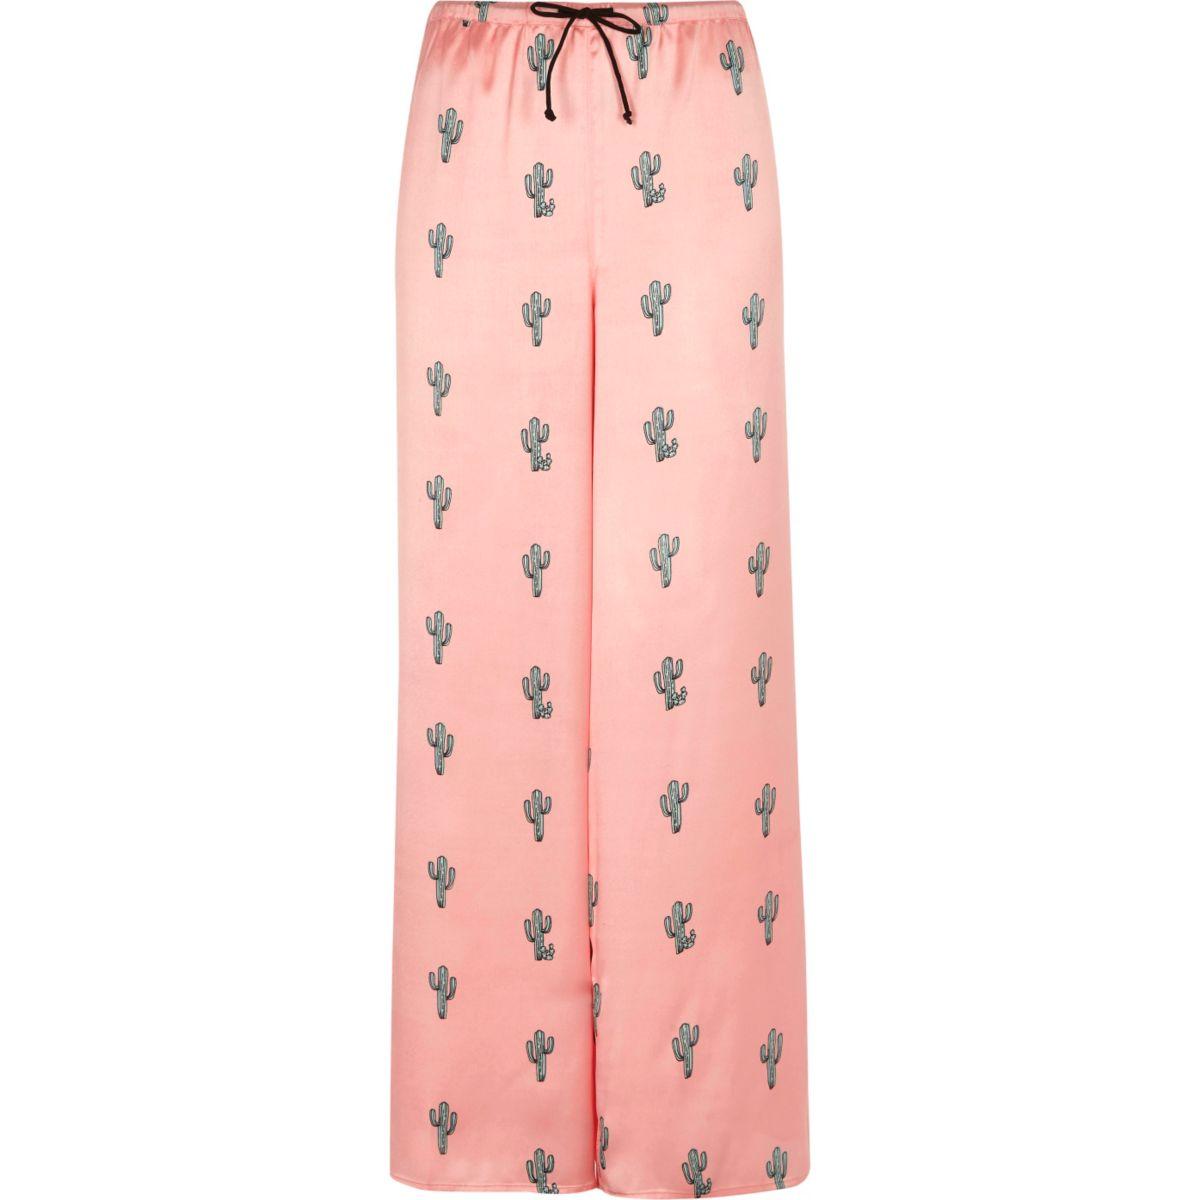 Rosa Pyjamahose mit Kaktusmuster